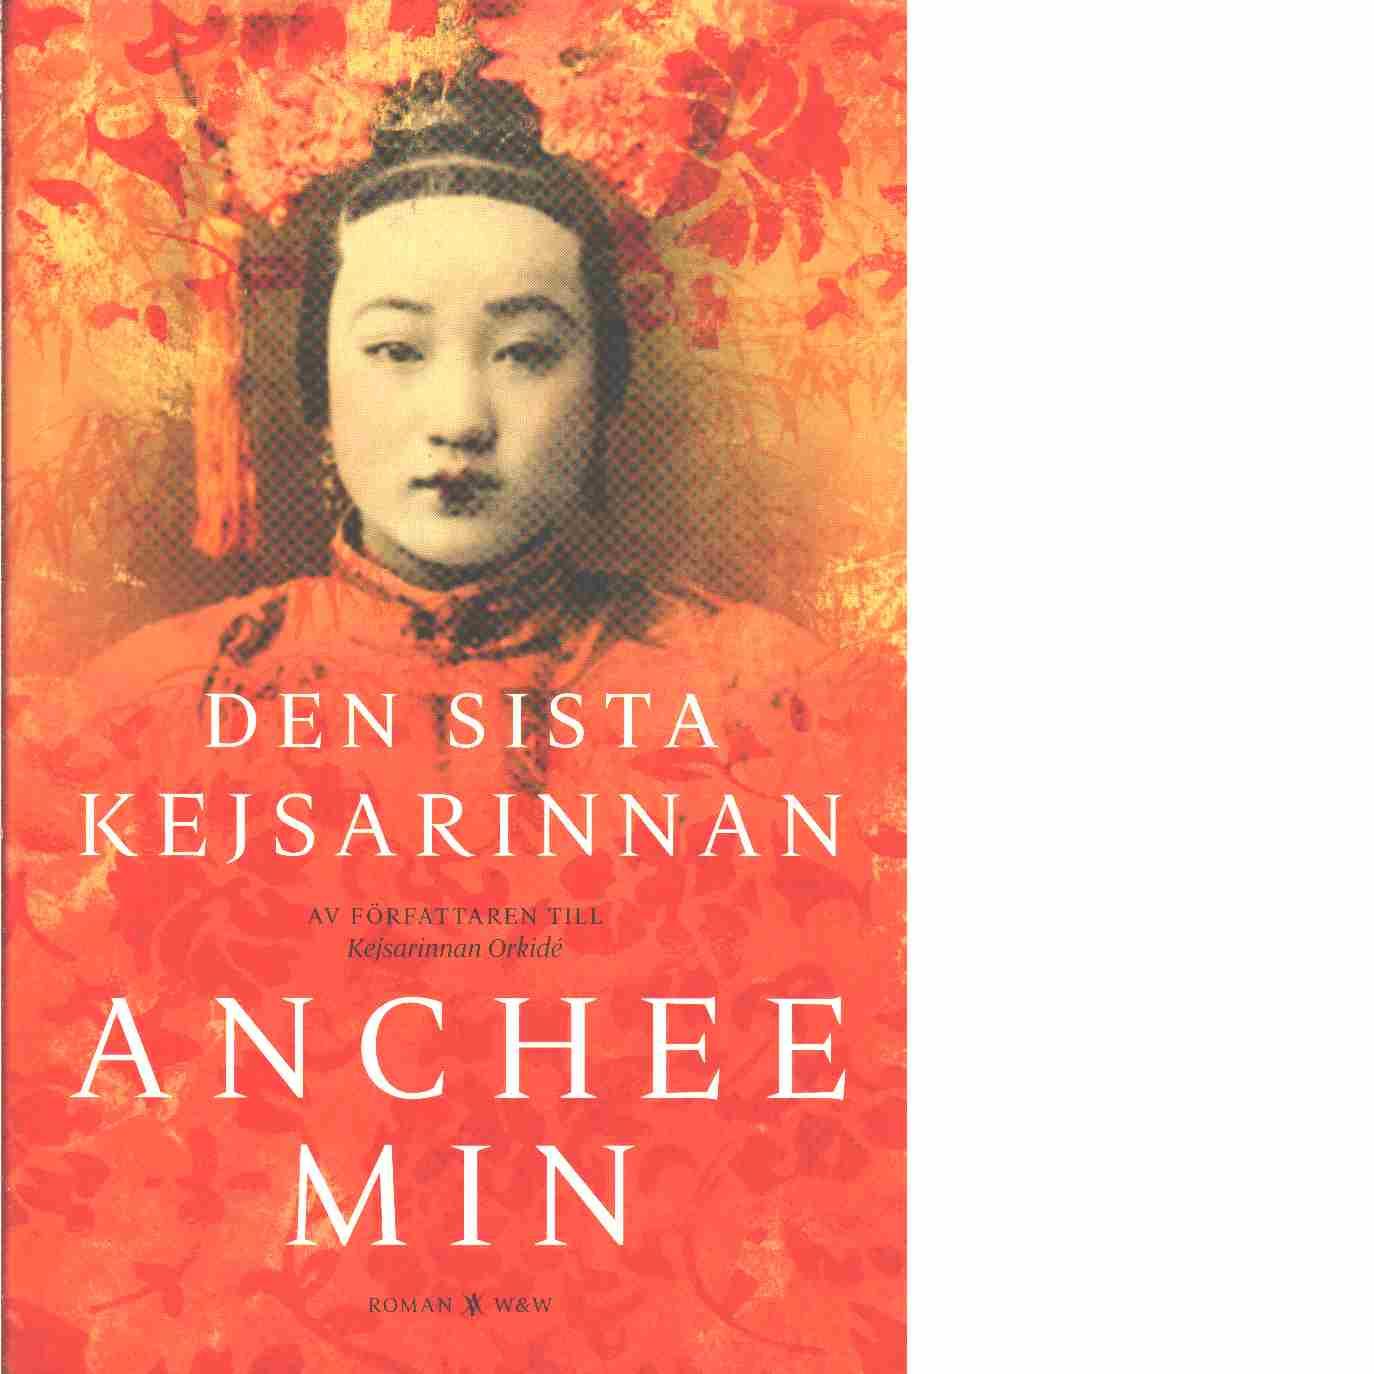 Den sista kejsarinnan - Min, Anchee